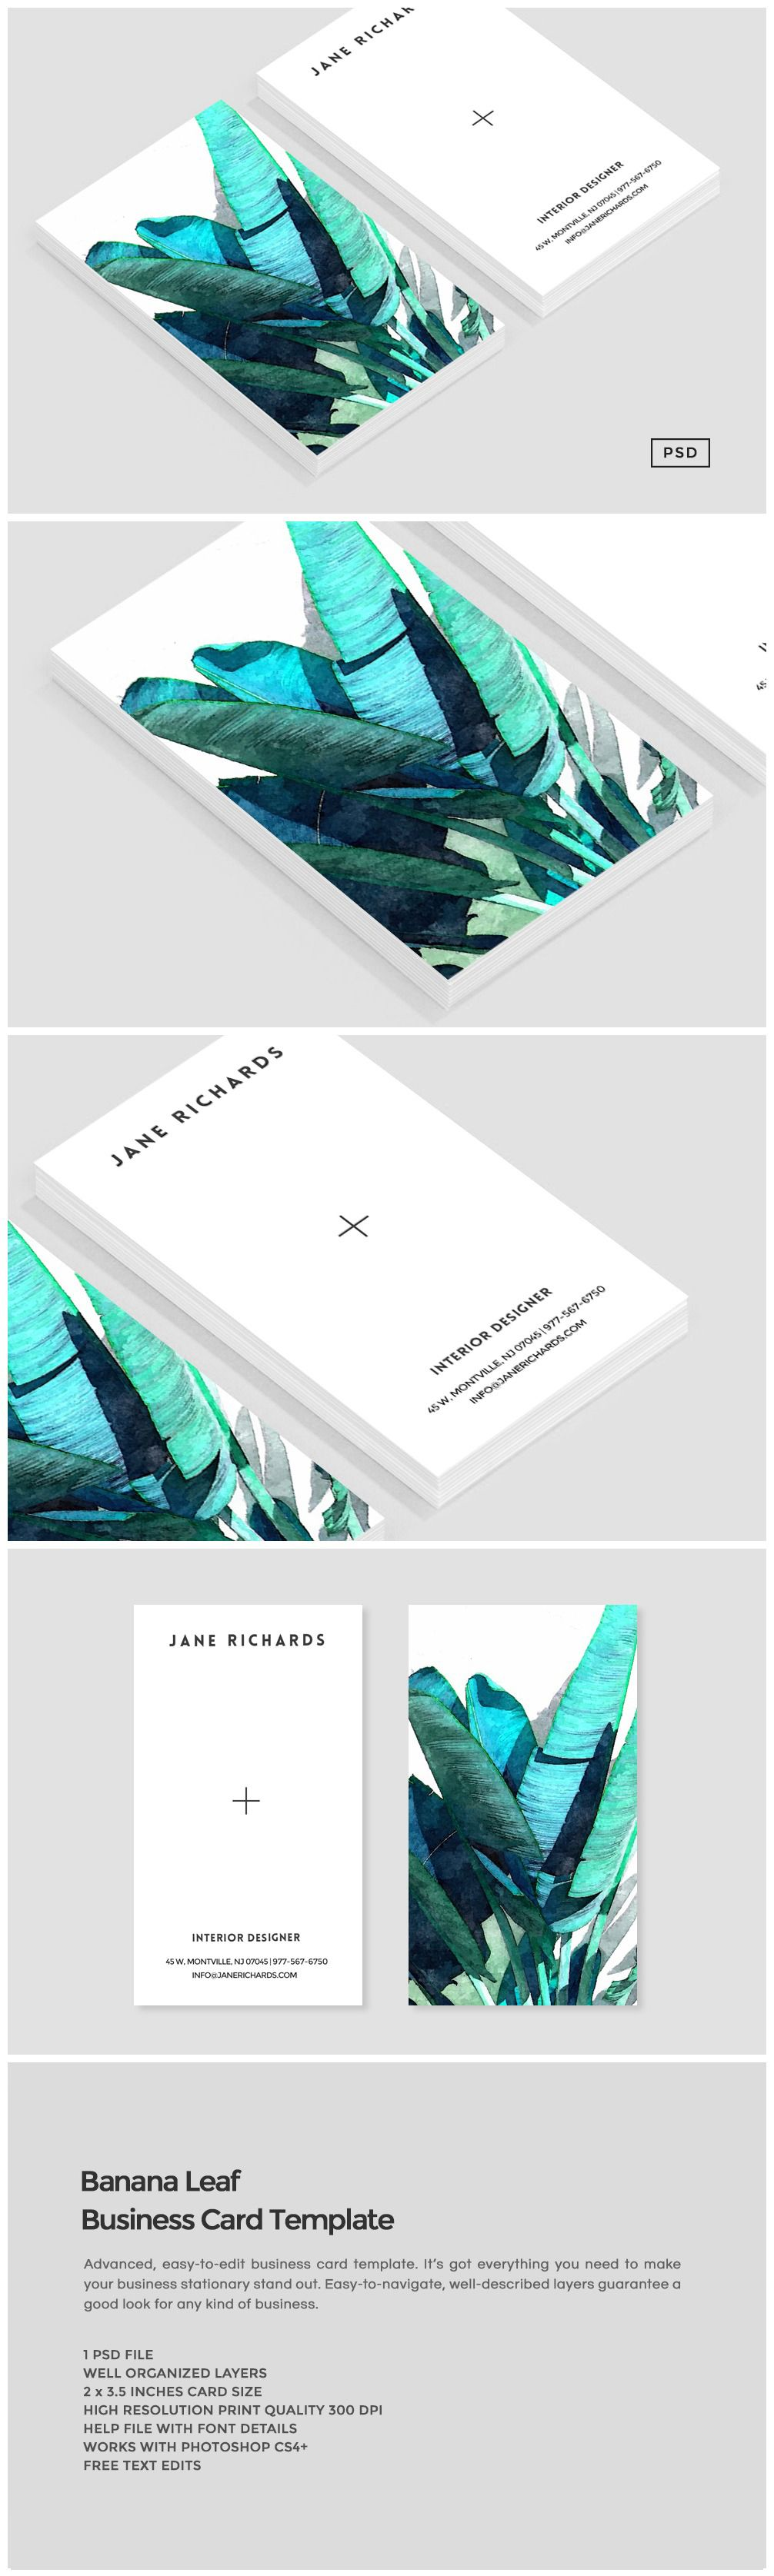 Banana Leaf Business Card Template | Tarjetas personales, Tarjetas y ...